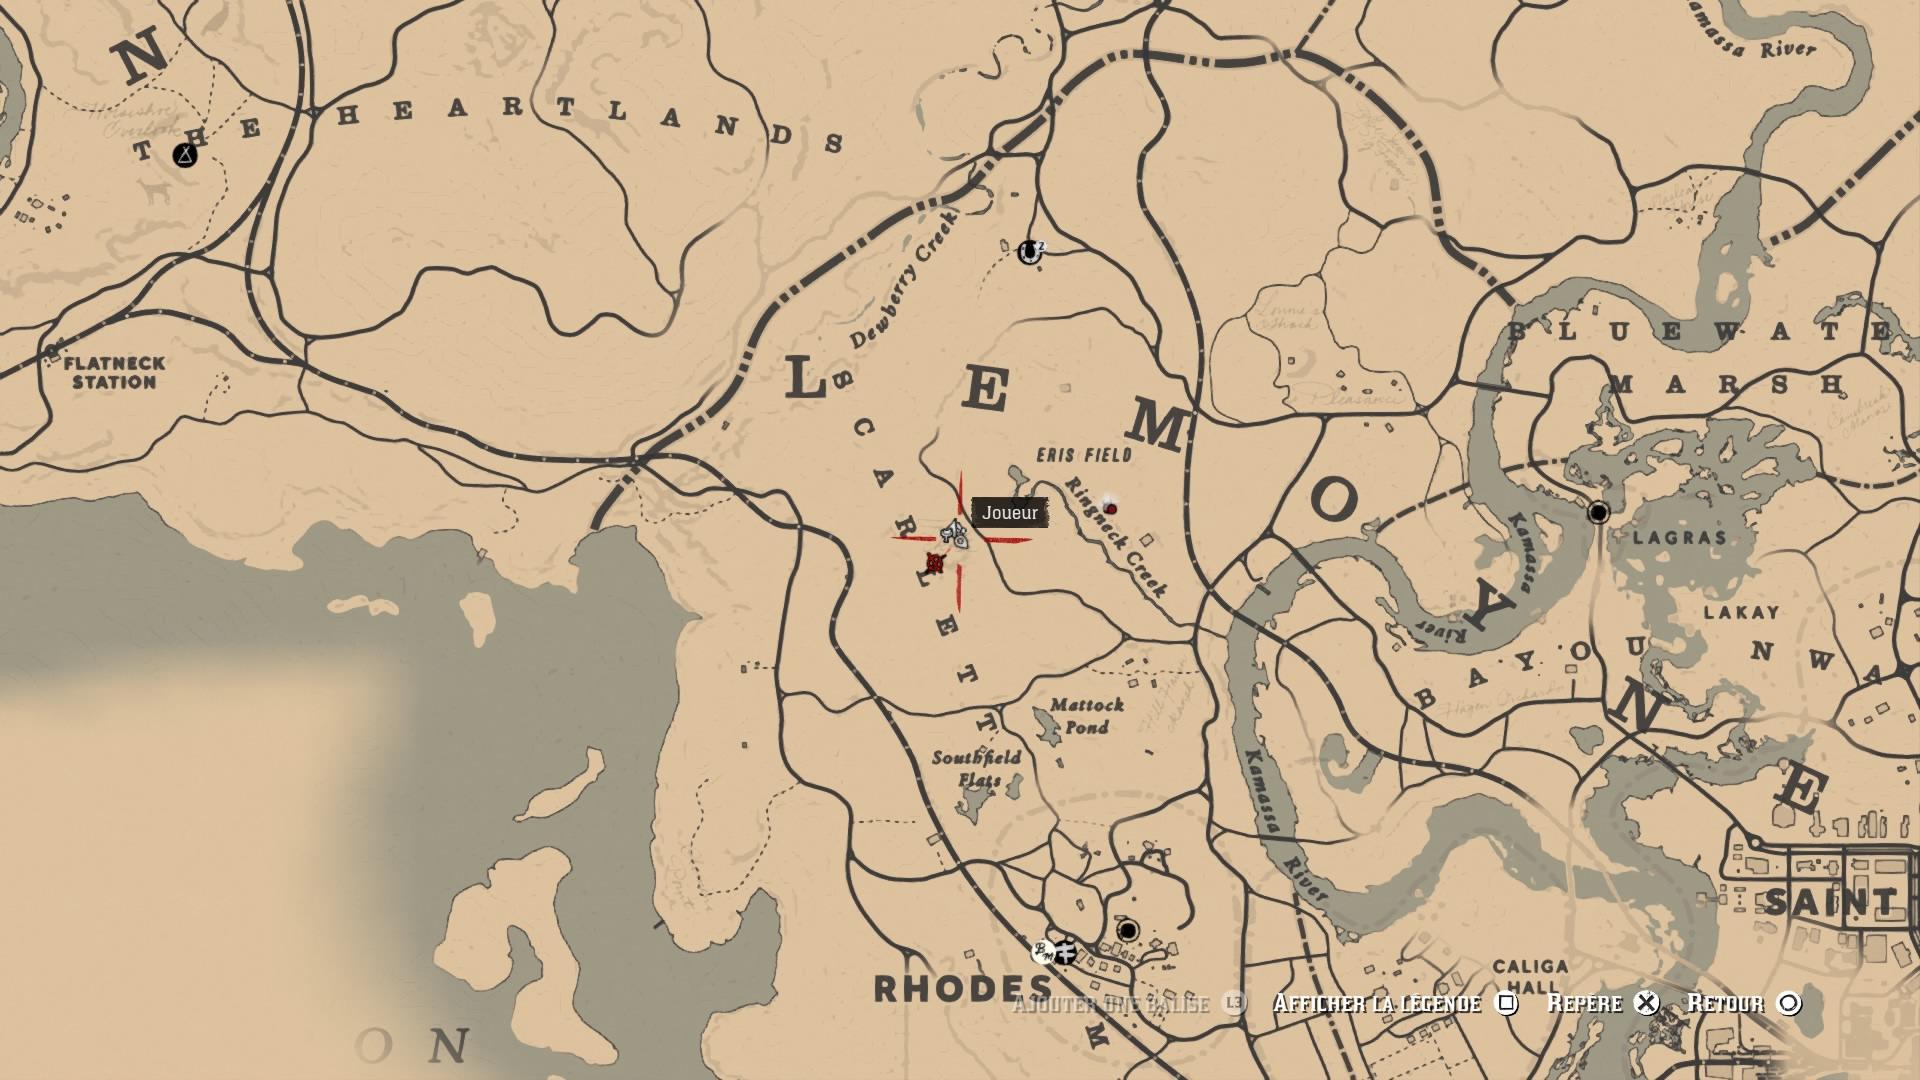 Carte Au Tresor Dechire.Soluce Red Dead Redemption 2 Les Tresors Caches Game